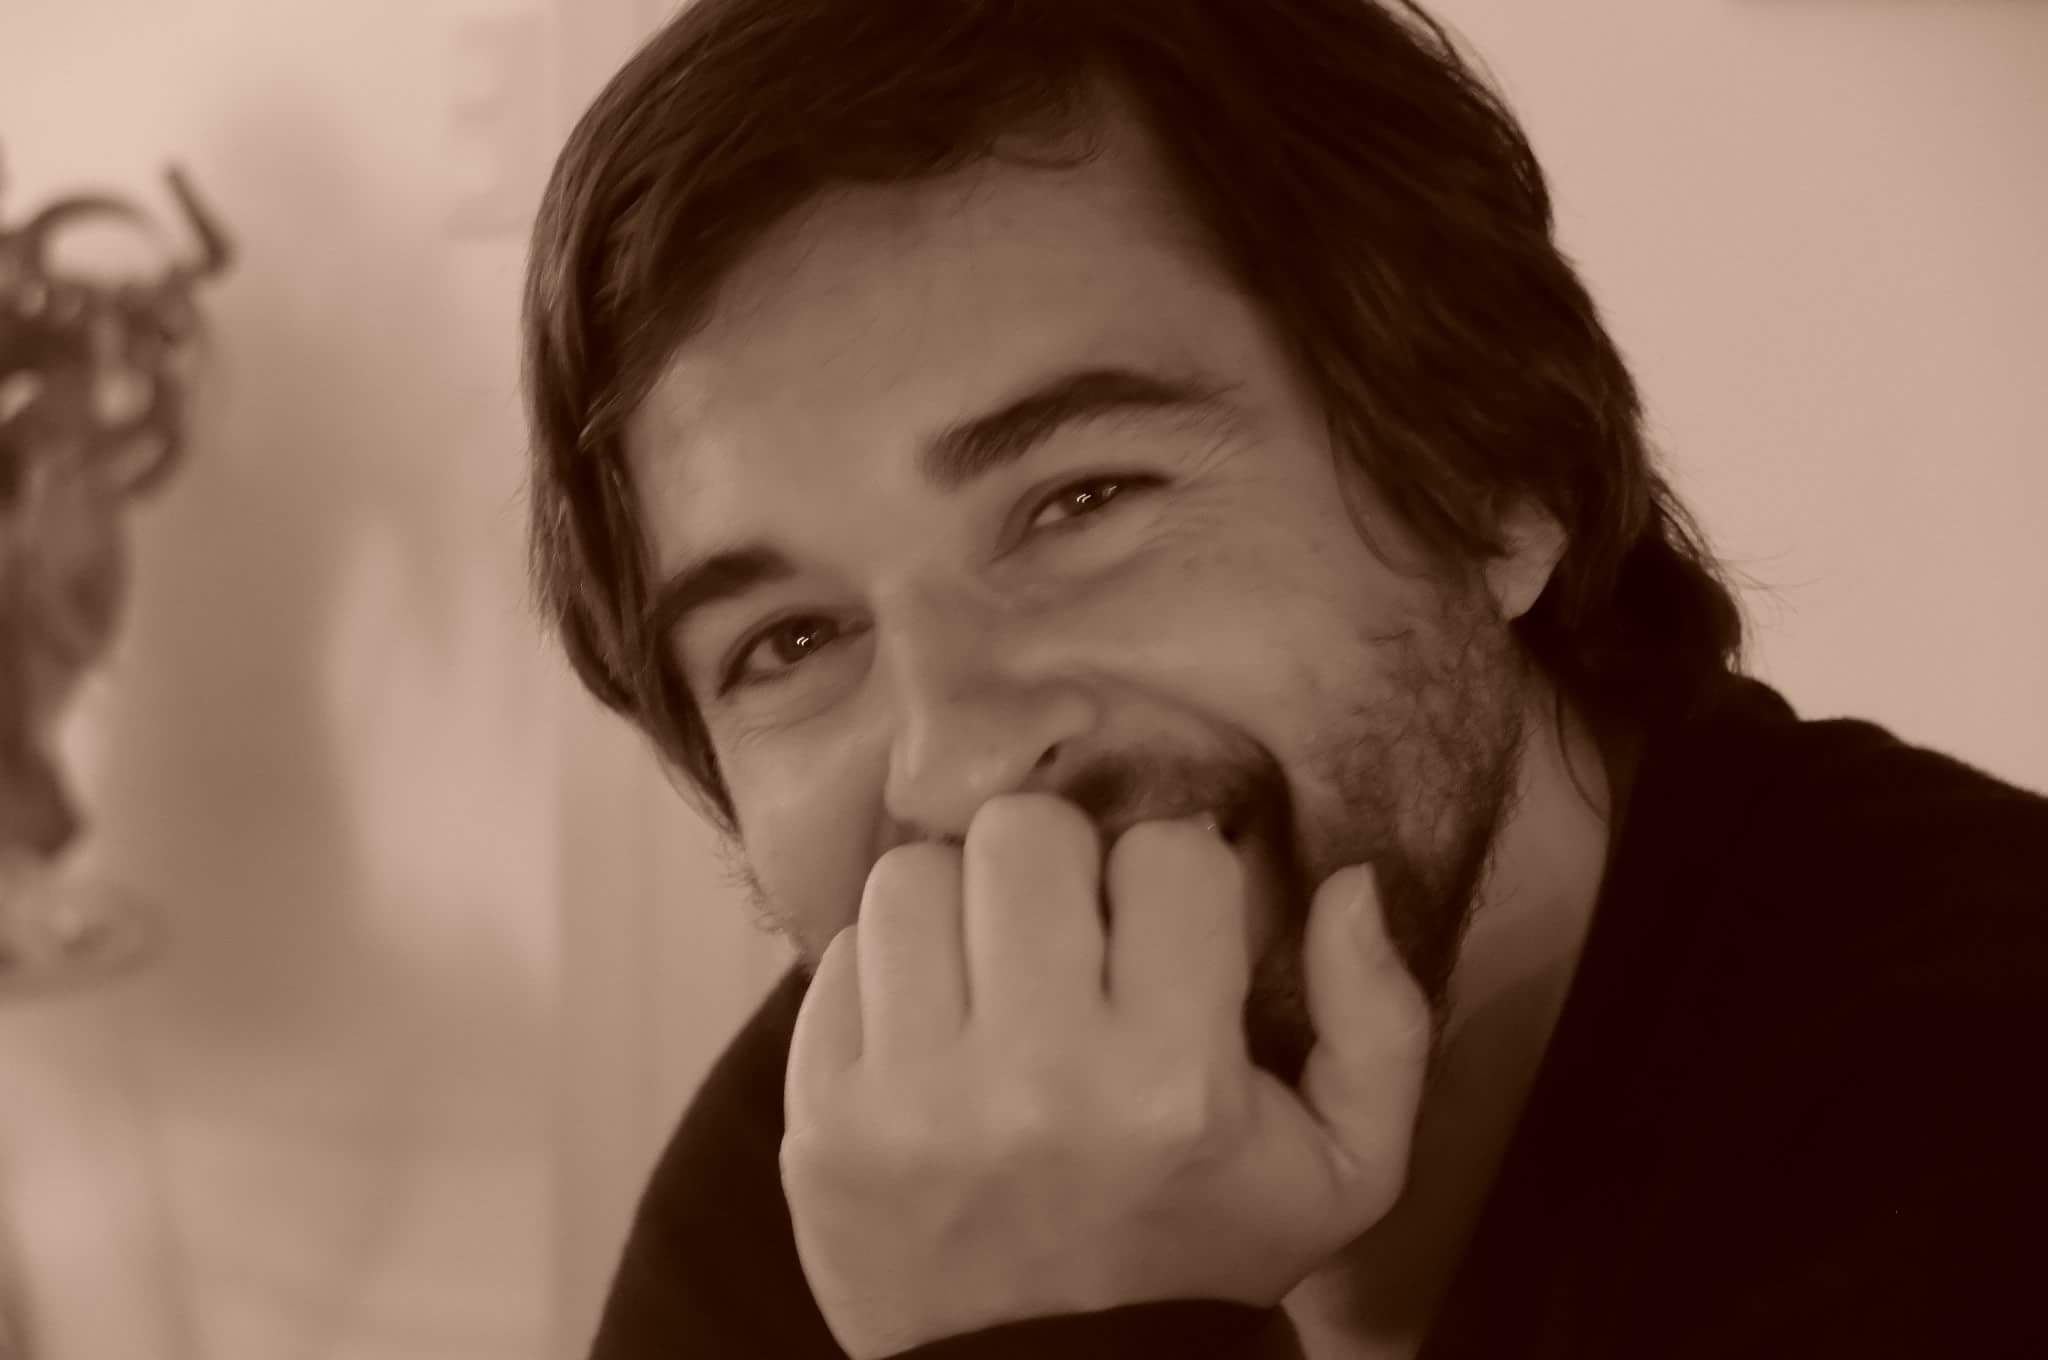 Guillaume Sacriste